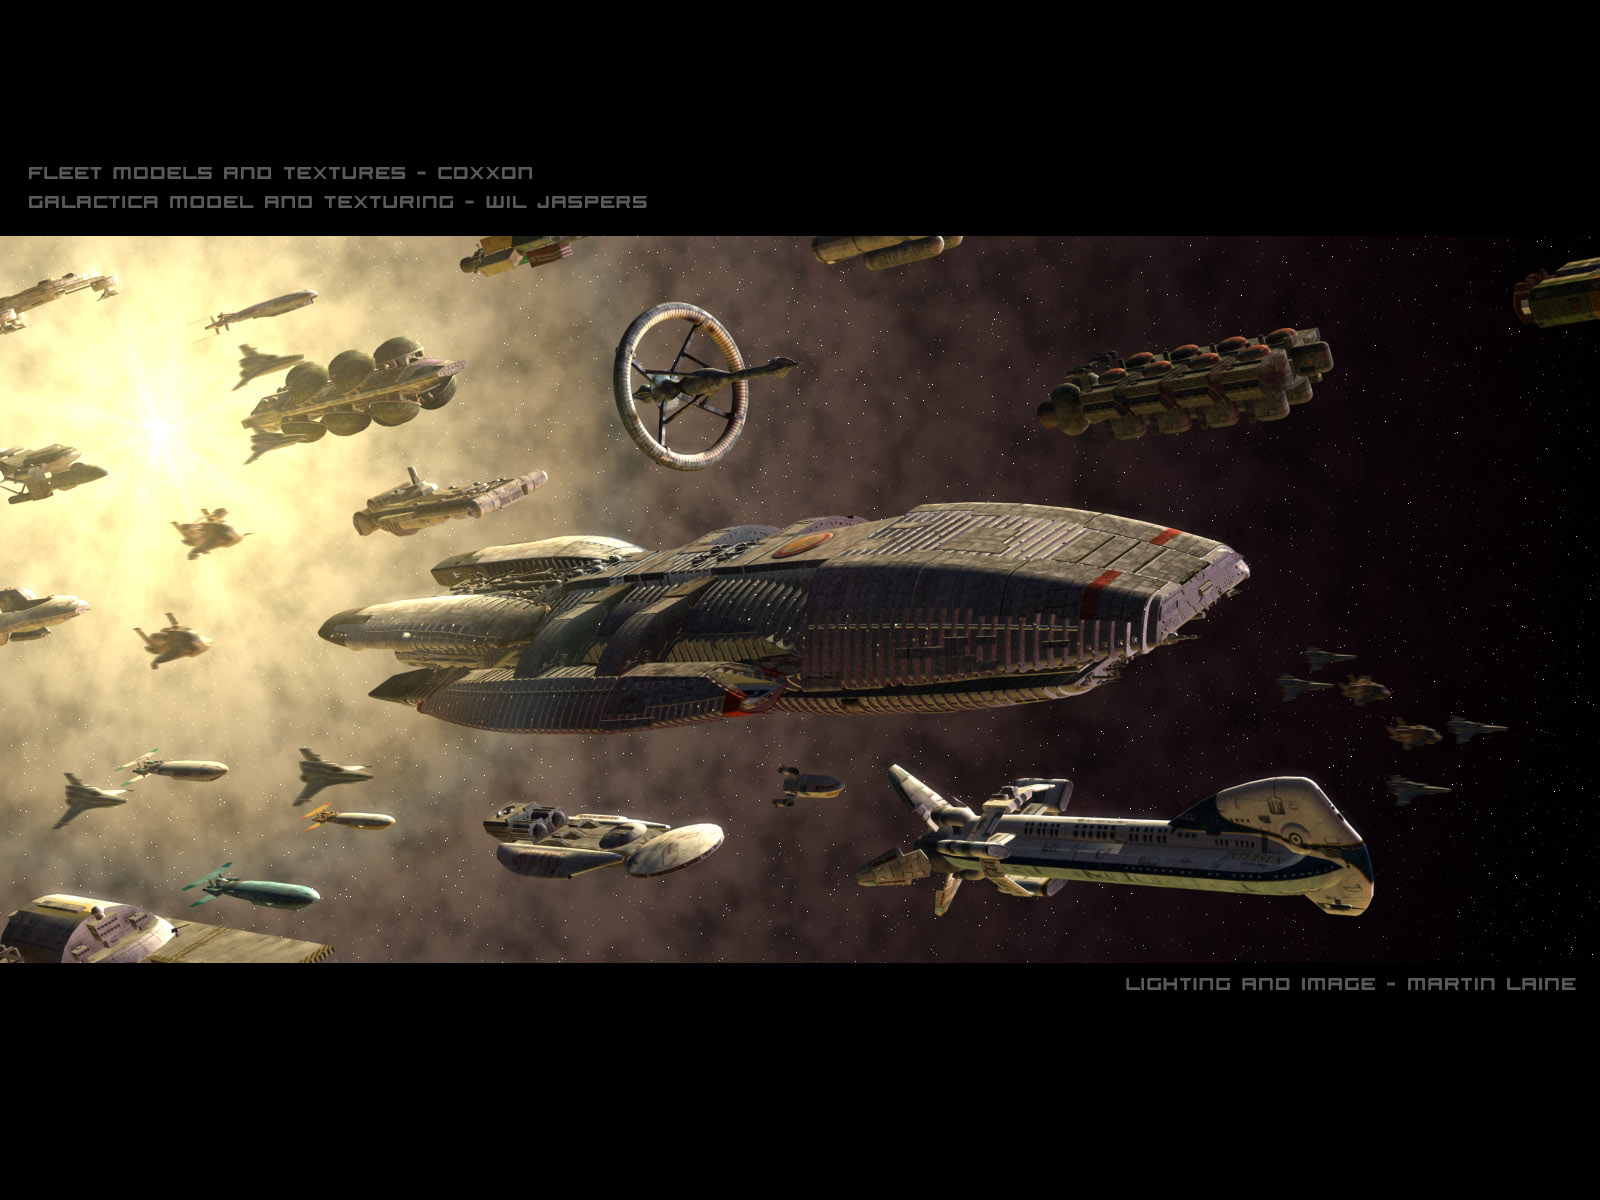 America's Doomsday Plan: Jumbo Jet on Steroids-battlestar-galactica-wallpaper-13.jpg